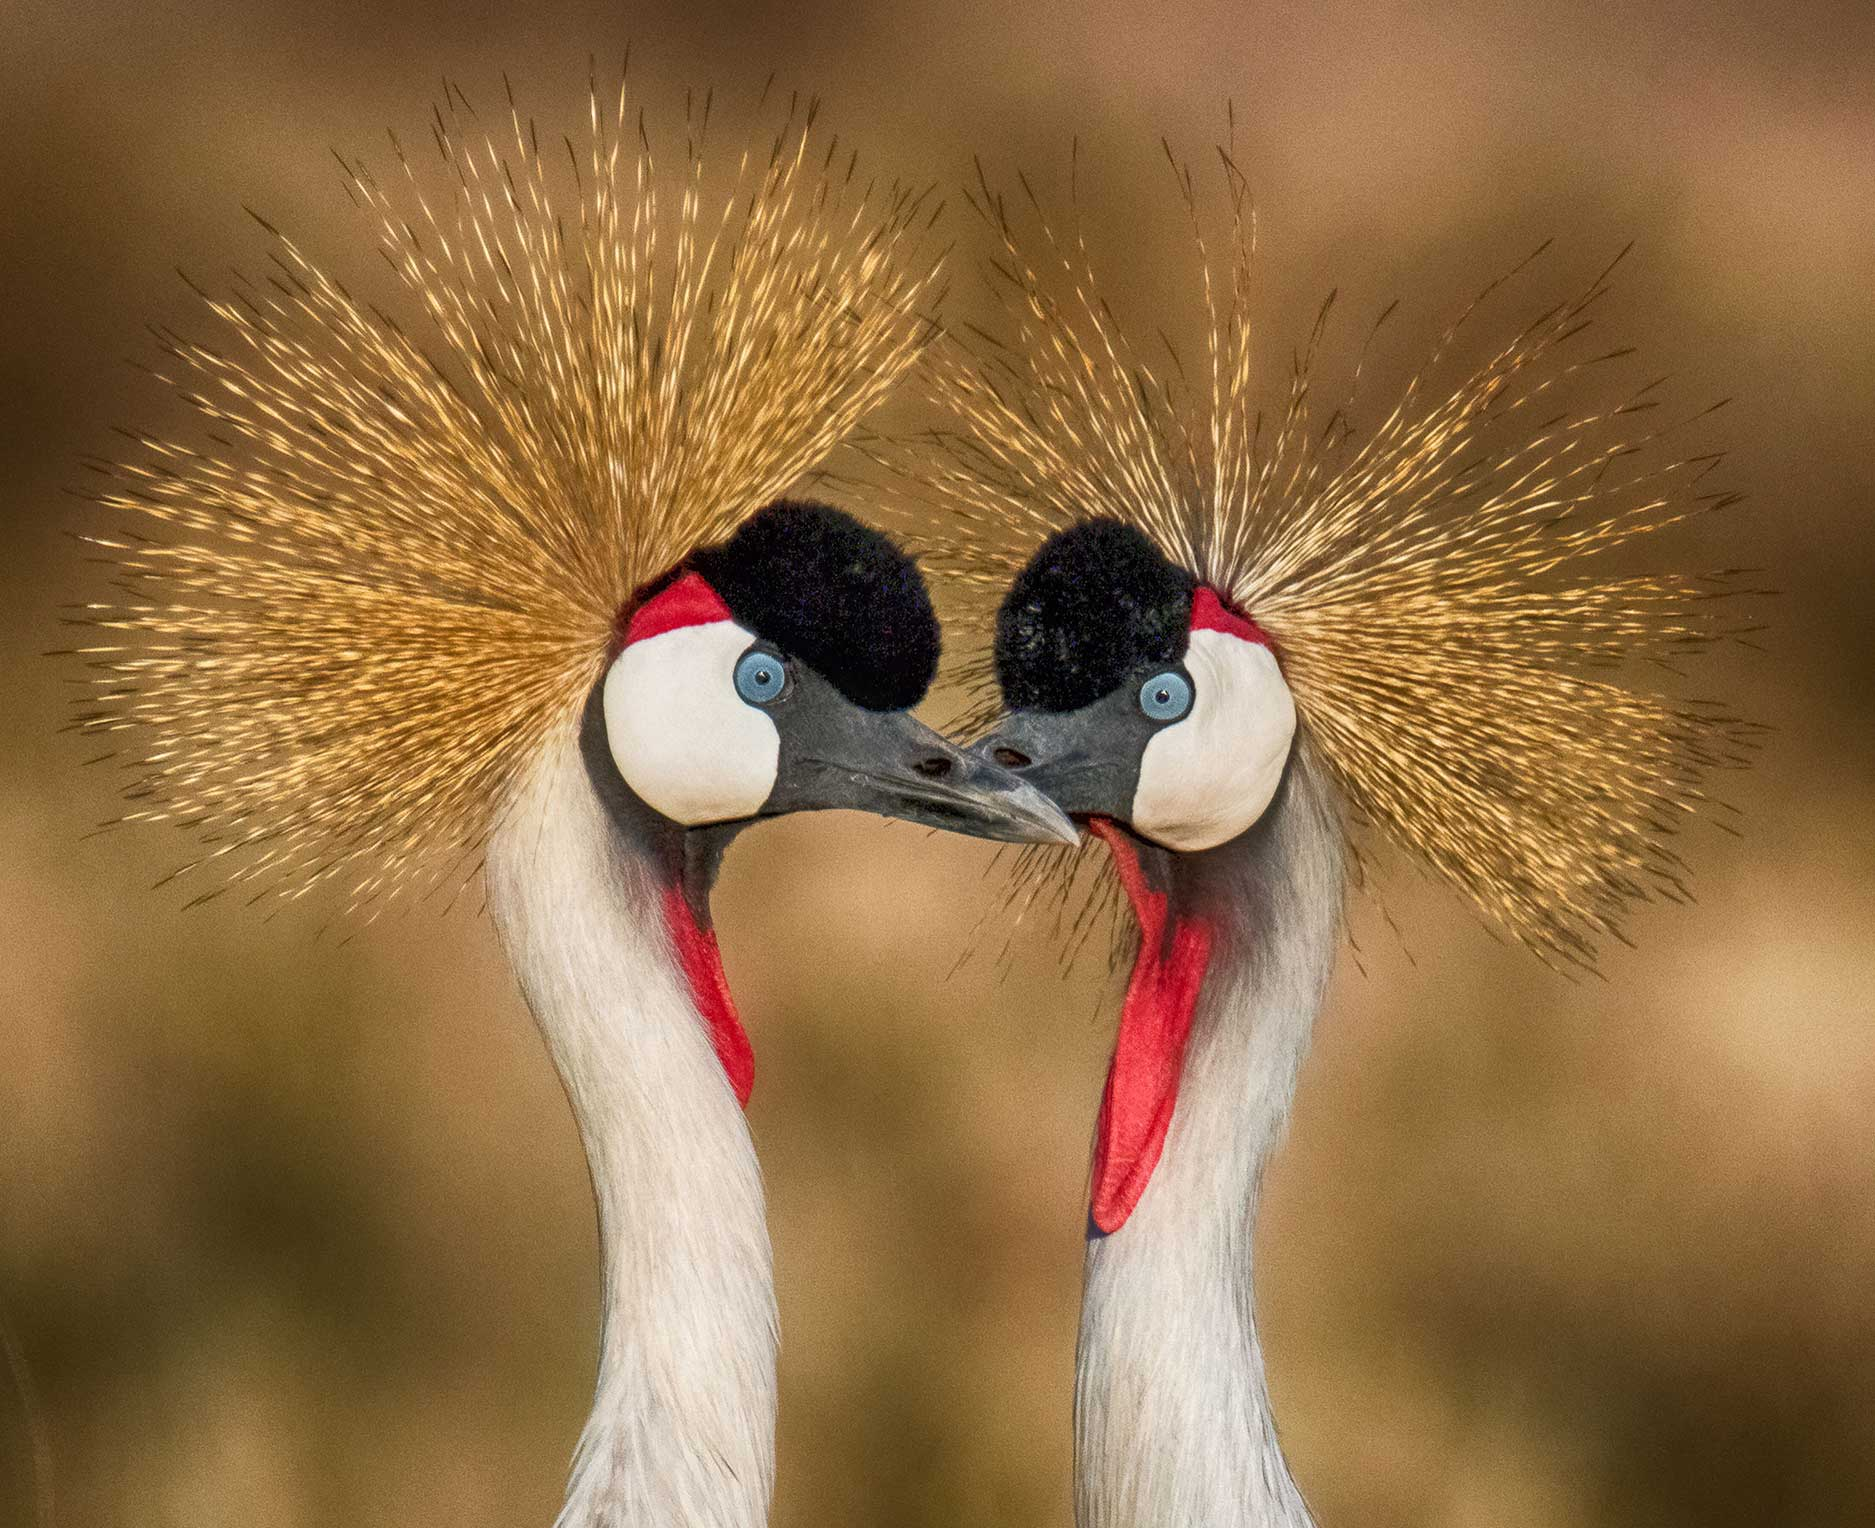 Two Cranes, Kenya